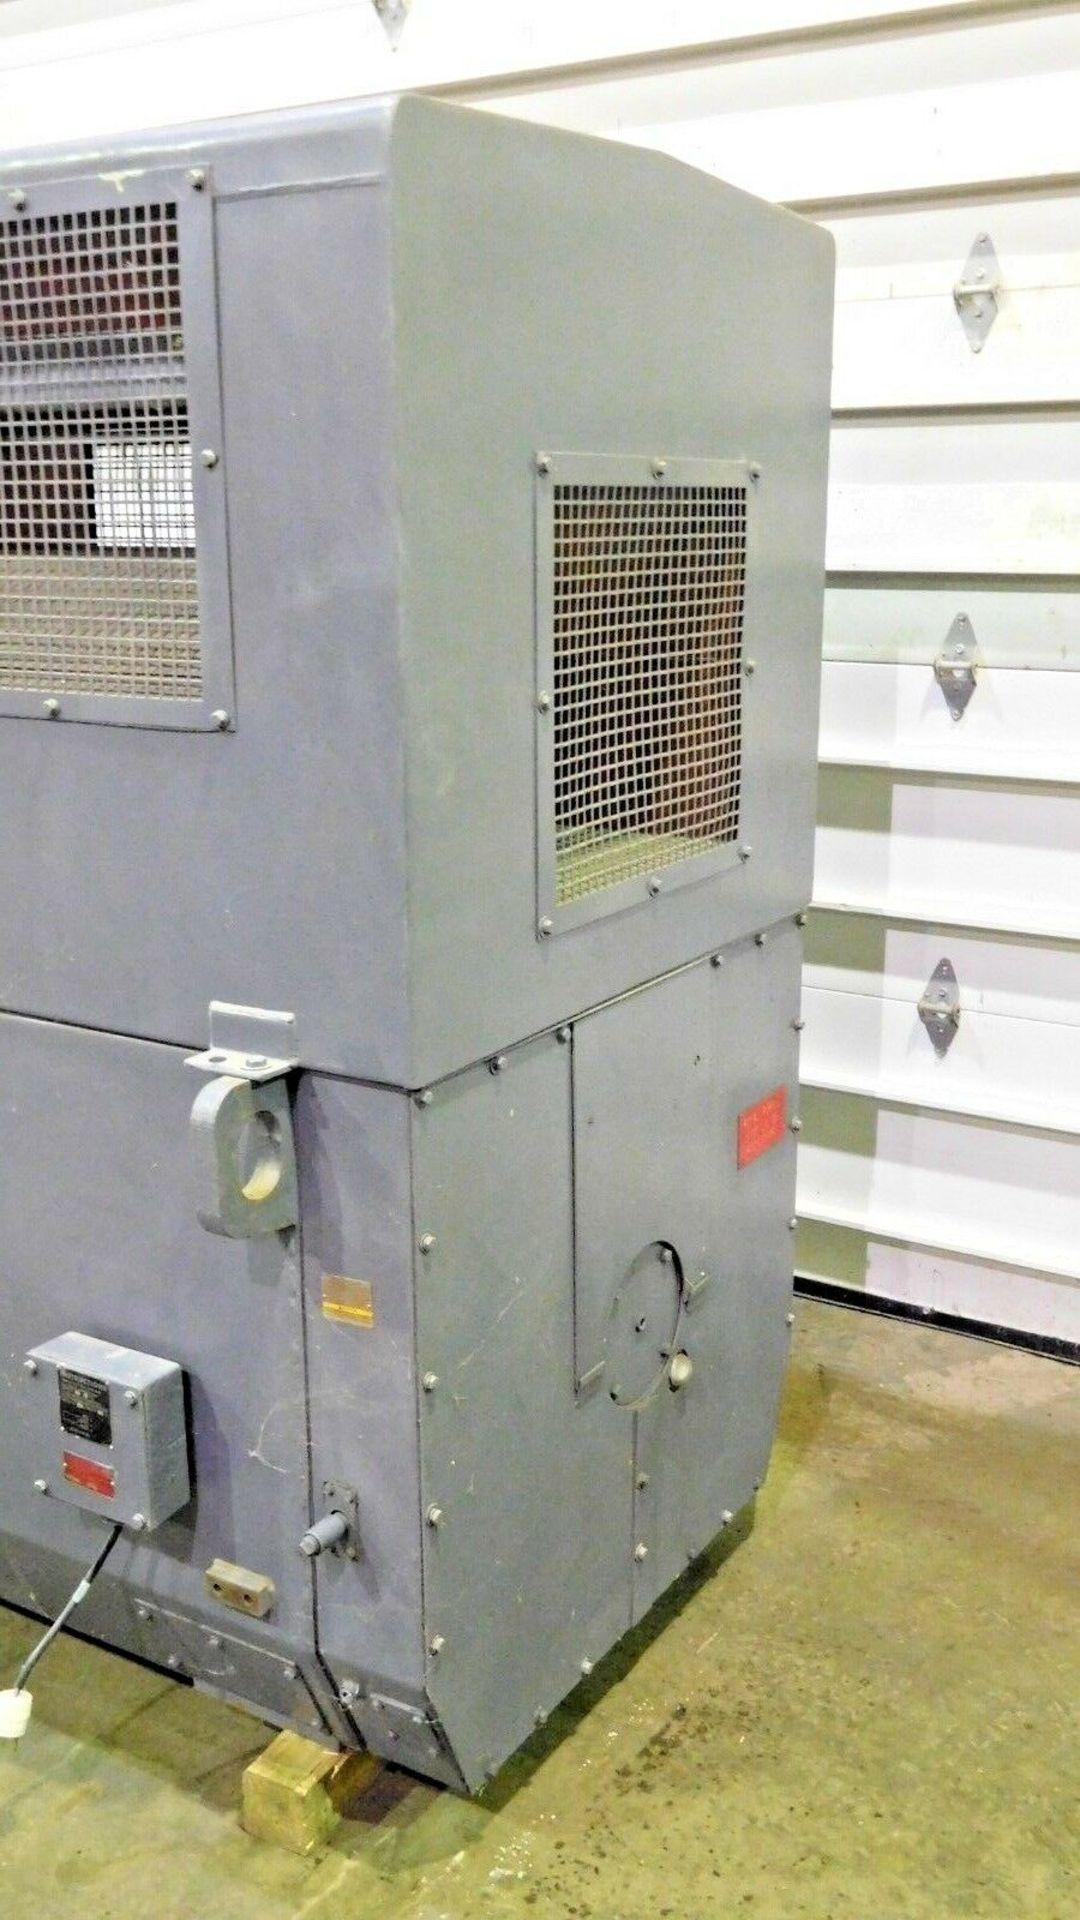 US Motors 600 HP Electric Motor. 890 RPM. 4000 V. 6809S. Type MS. 60 Hz. 3 Ph. - Image 4 of 5